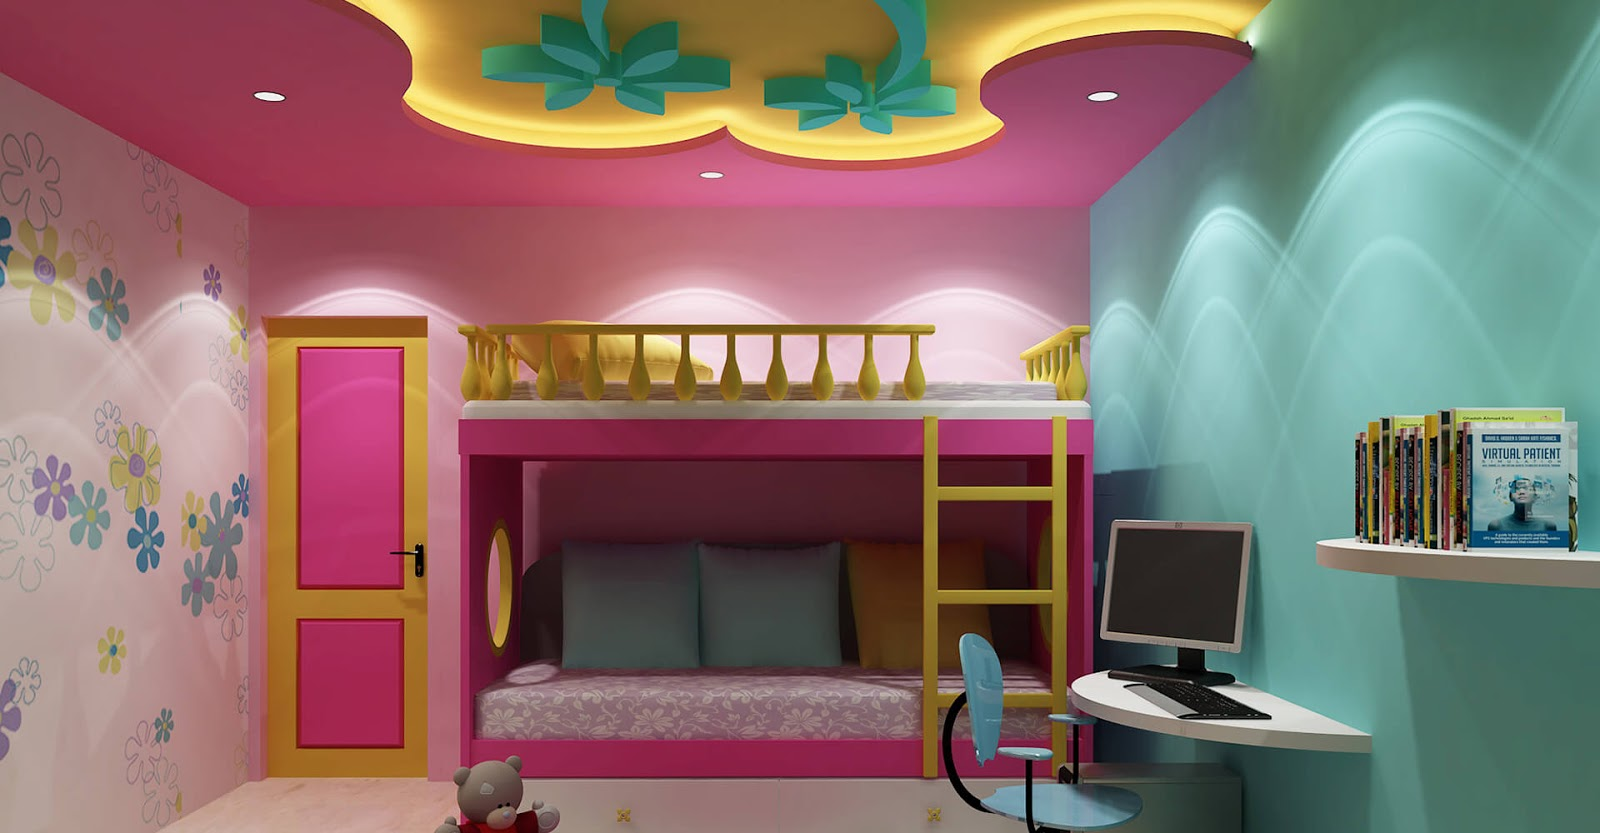 Top 25 False Ceiling Design Options For Kids Rooms